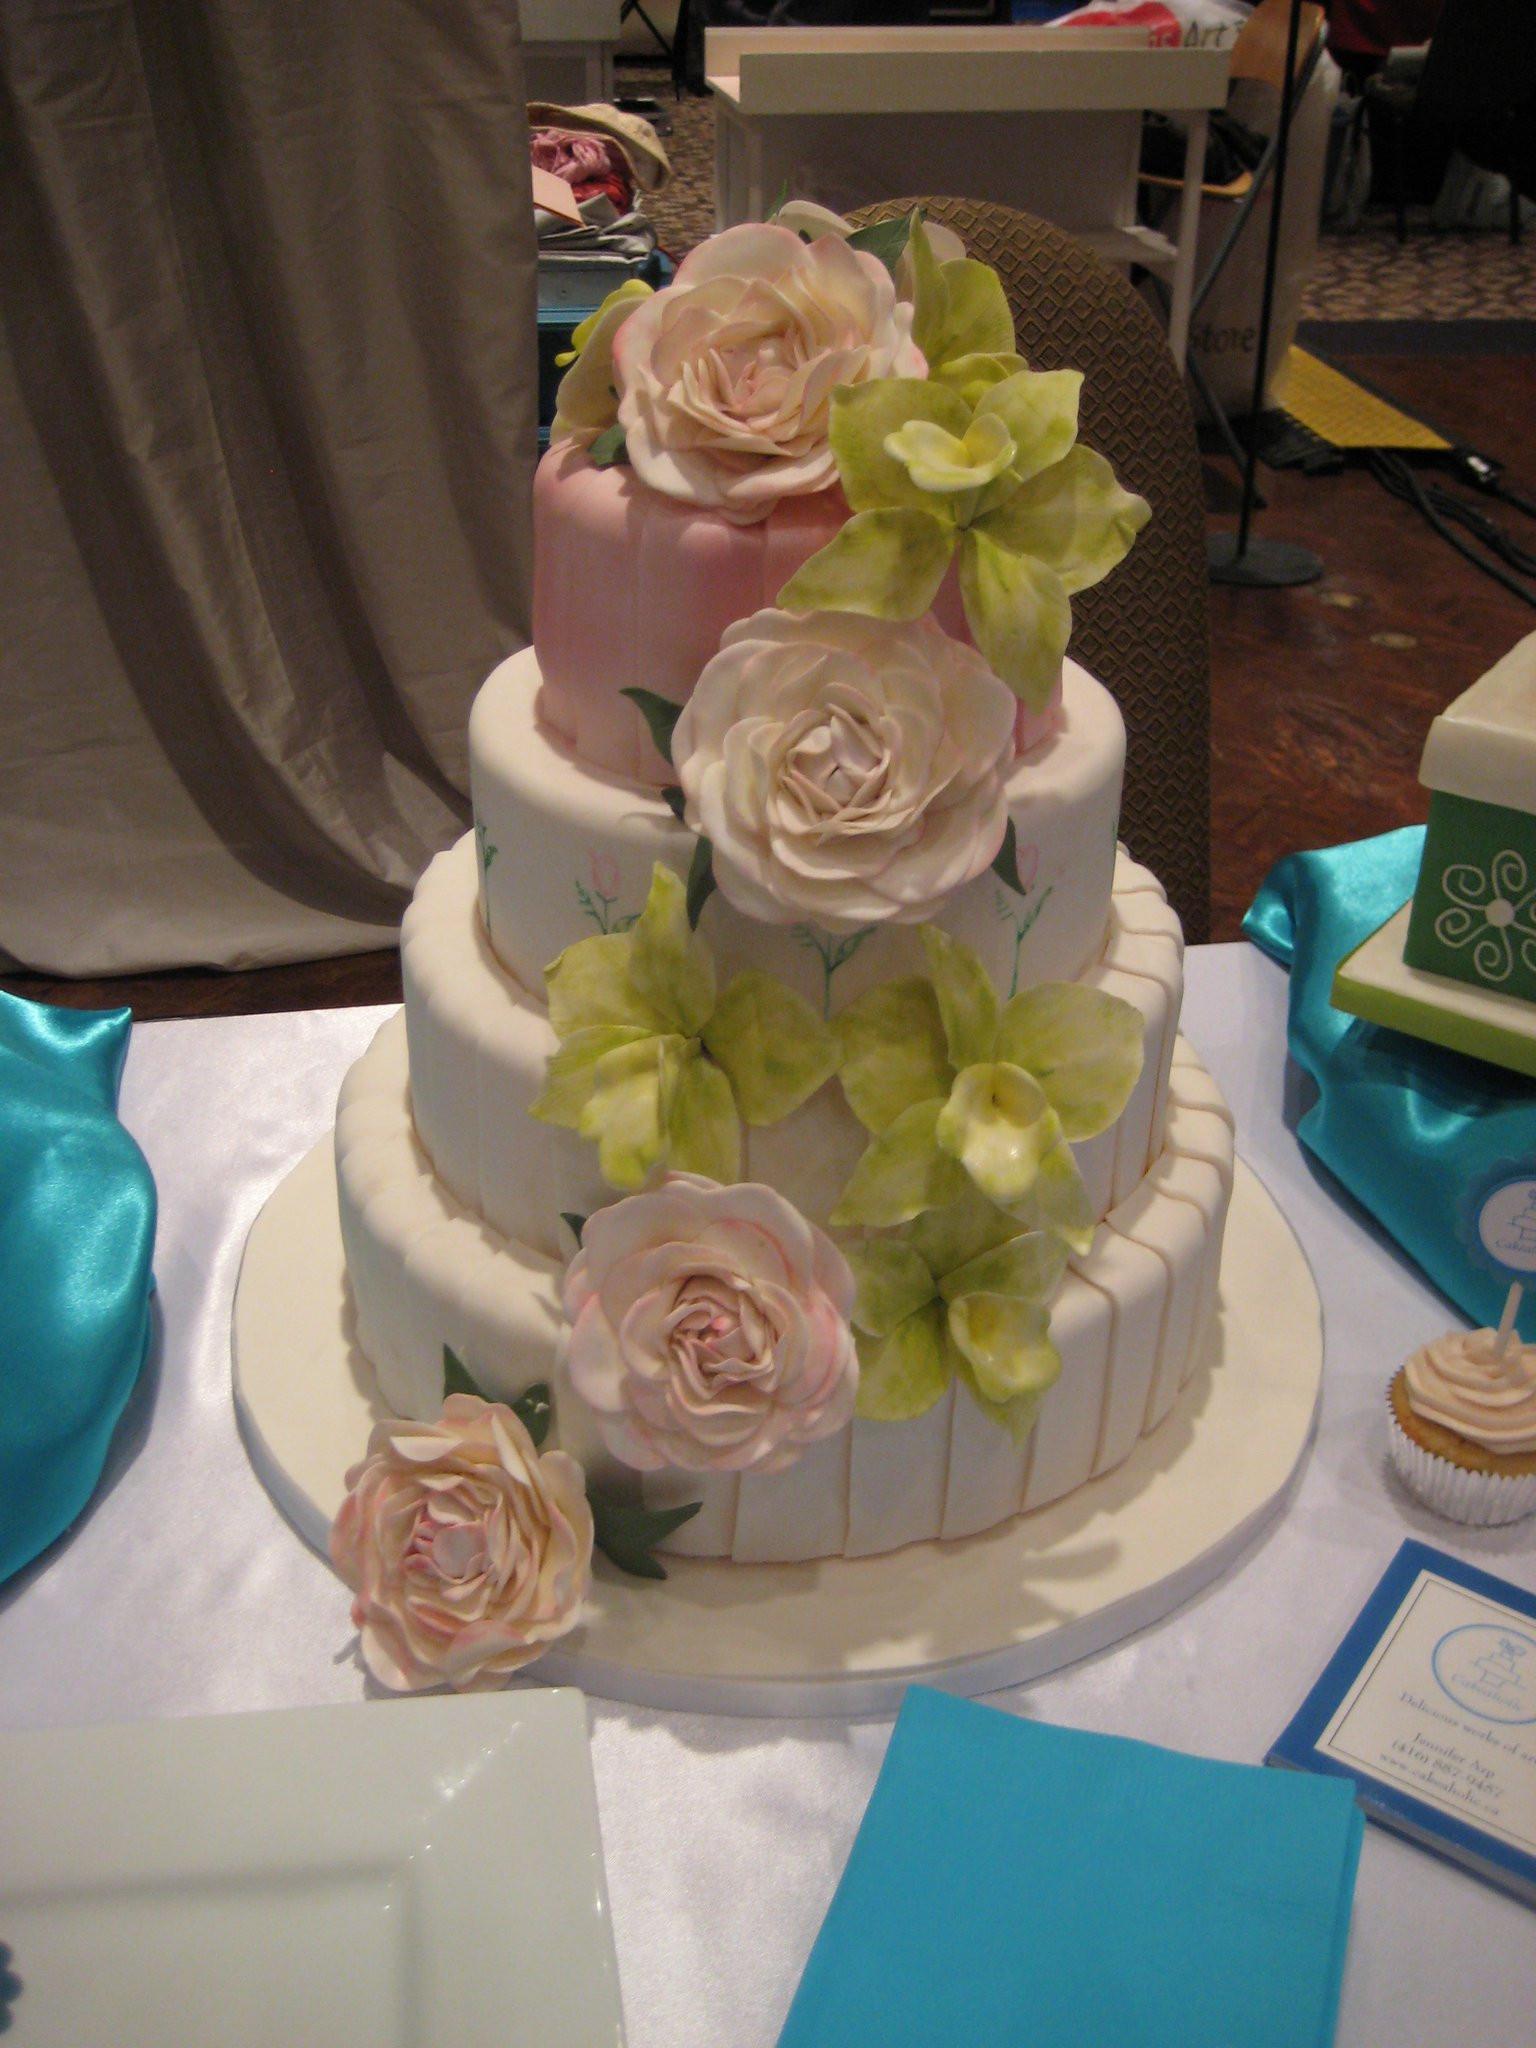 Wedding Cakes Show  2011 Wedding Show Cakes Diary of a Cakeaholic